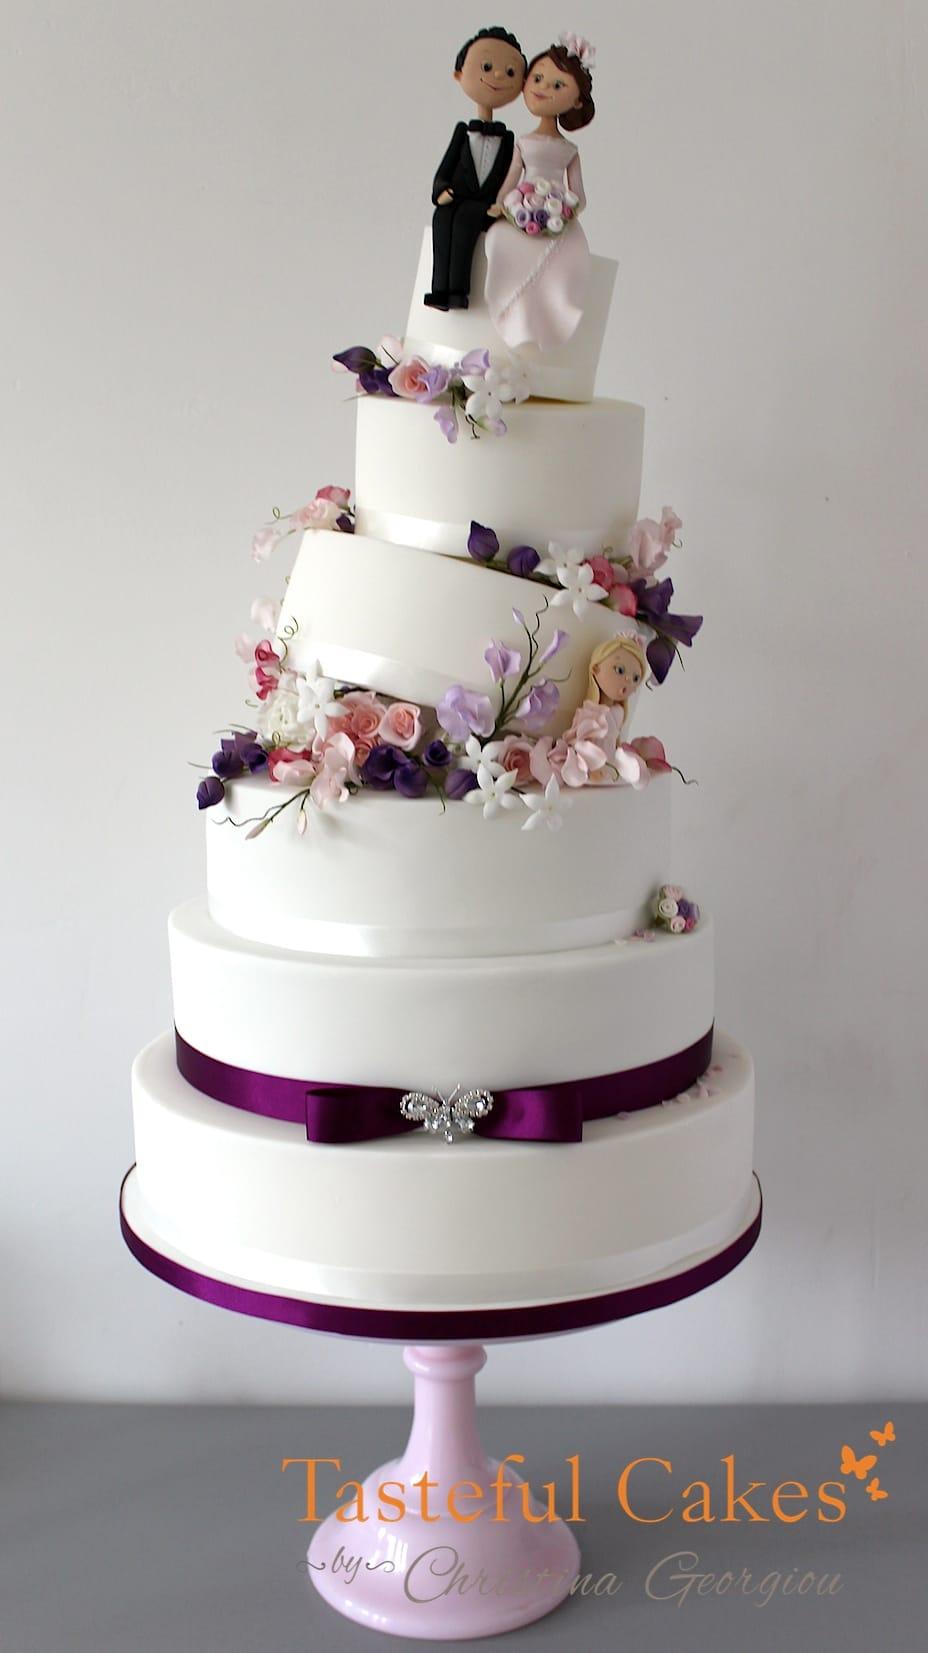 Topsy Turvy Wedding Cake Topper - 5000+ Simple Wedding Cakes